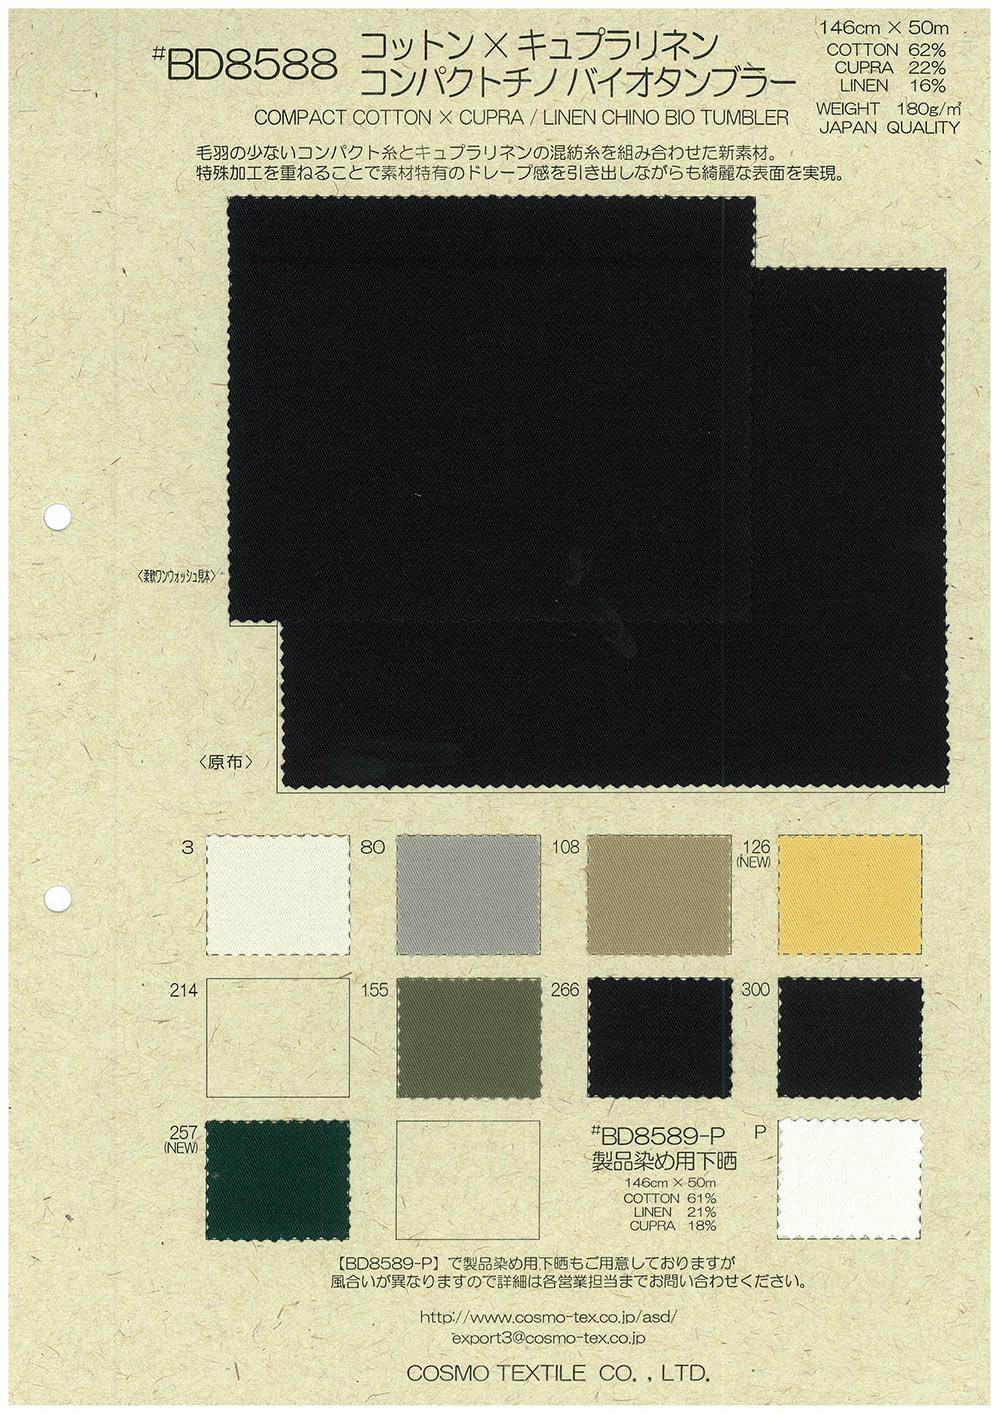 BD8588 綿キュプラリネンBIO[生地] コスモテキスタイル/オークラ商事 - ApparelX アパレル資材卸通販